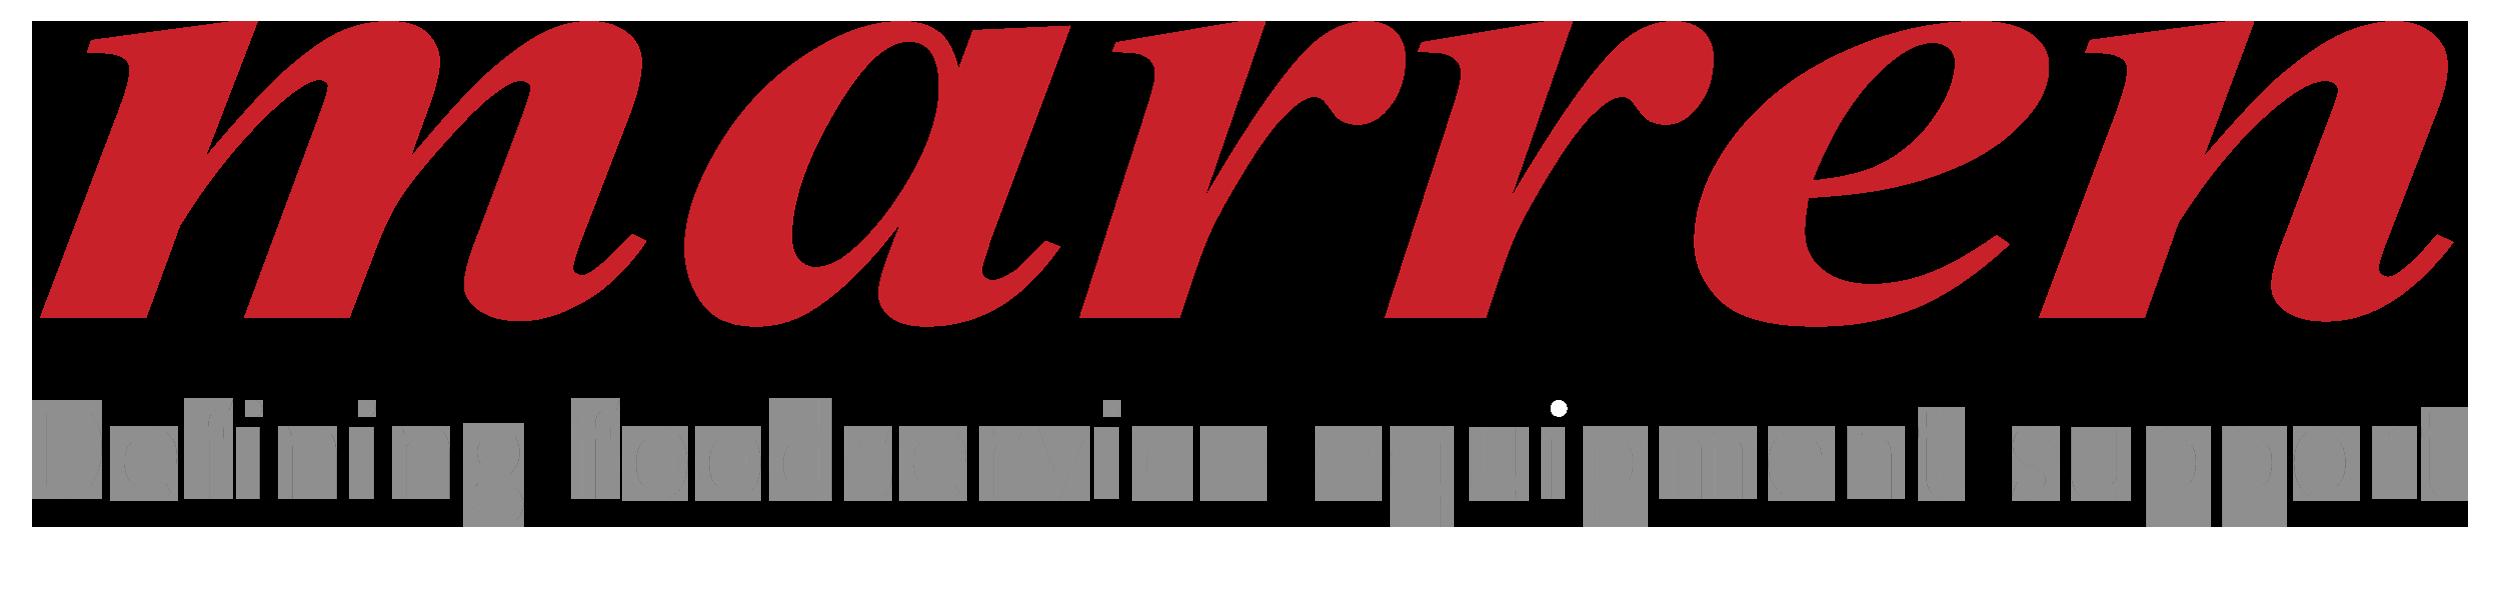 Warranty Service Call